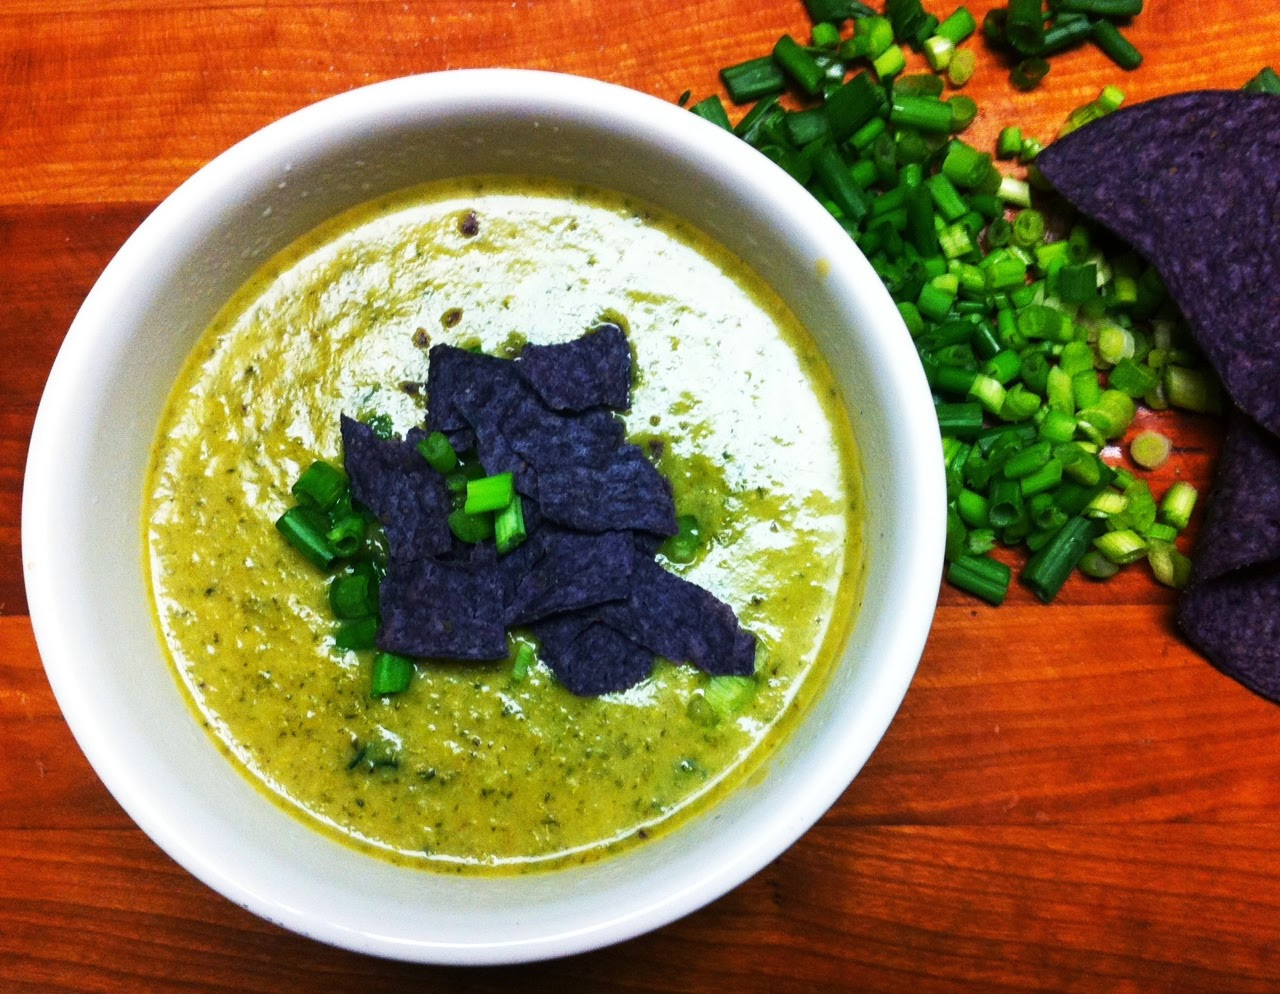 Vegan Cream Of Broccoli Soup  Grubarazzi Simply Vegan Cream of Broccoli Soup